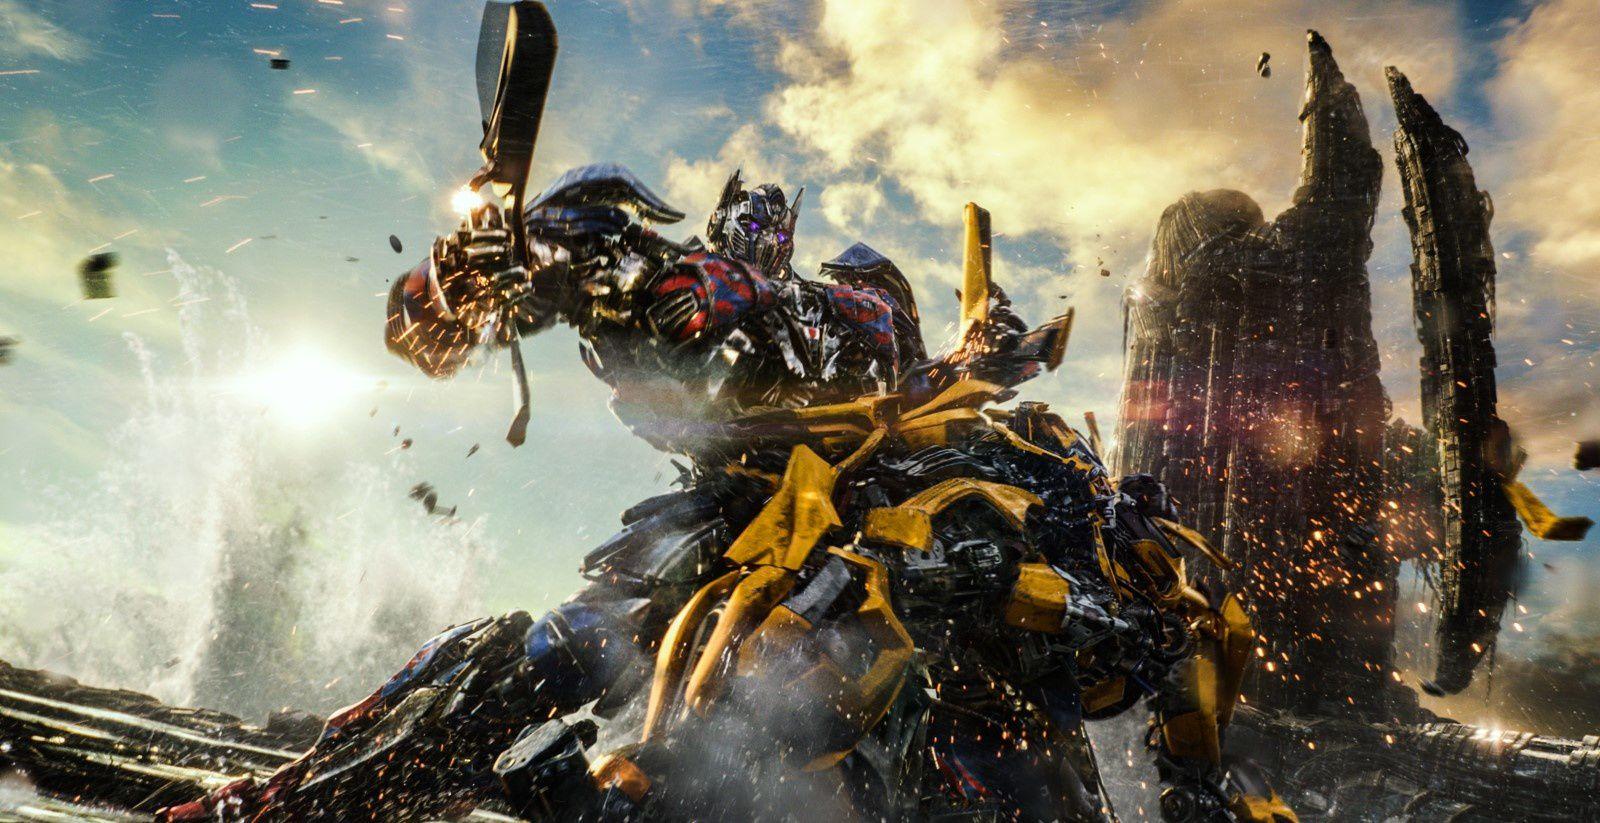 [critique] Transformers, the Last Knight